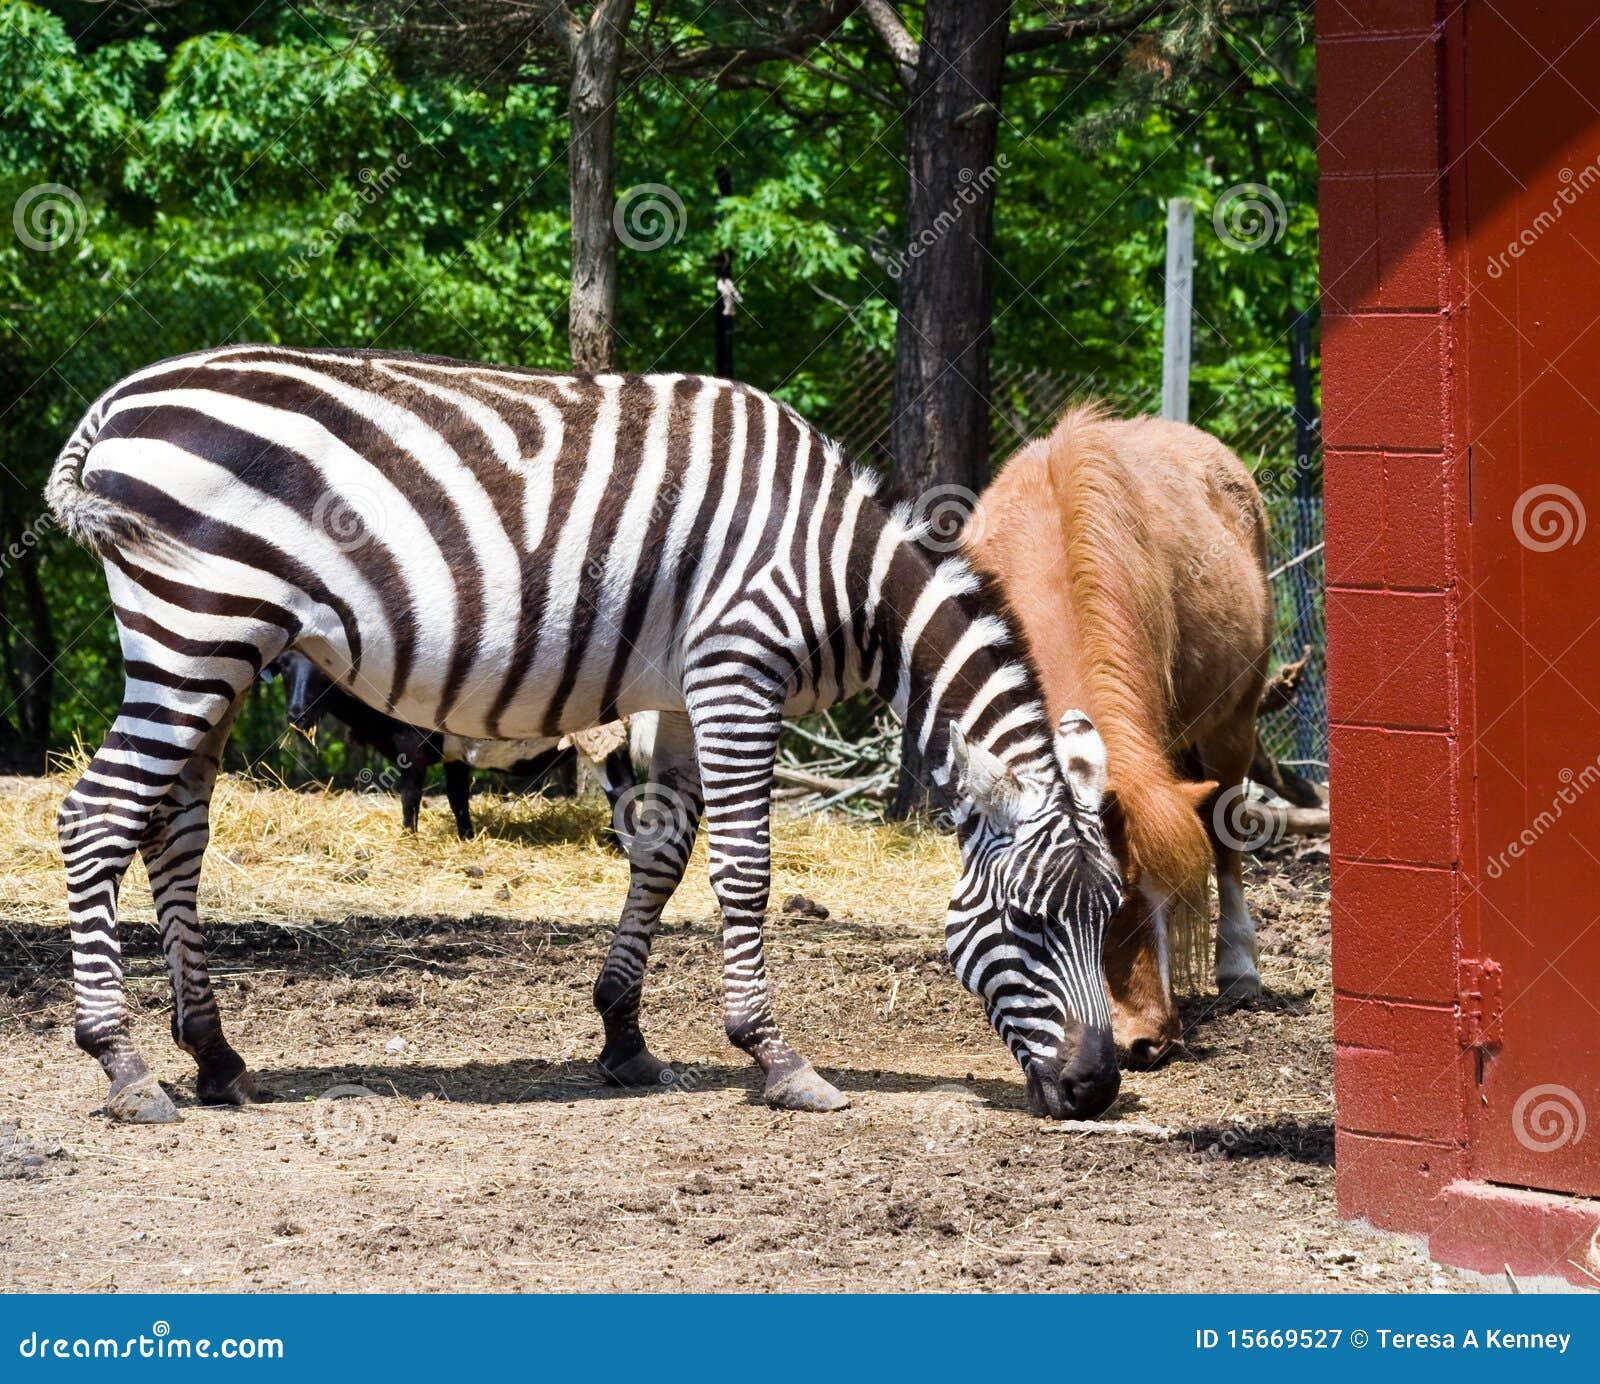 Zebra At Rescue Farm Stock Image Image Of Horses Living